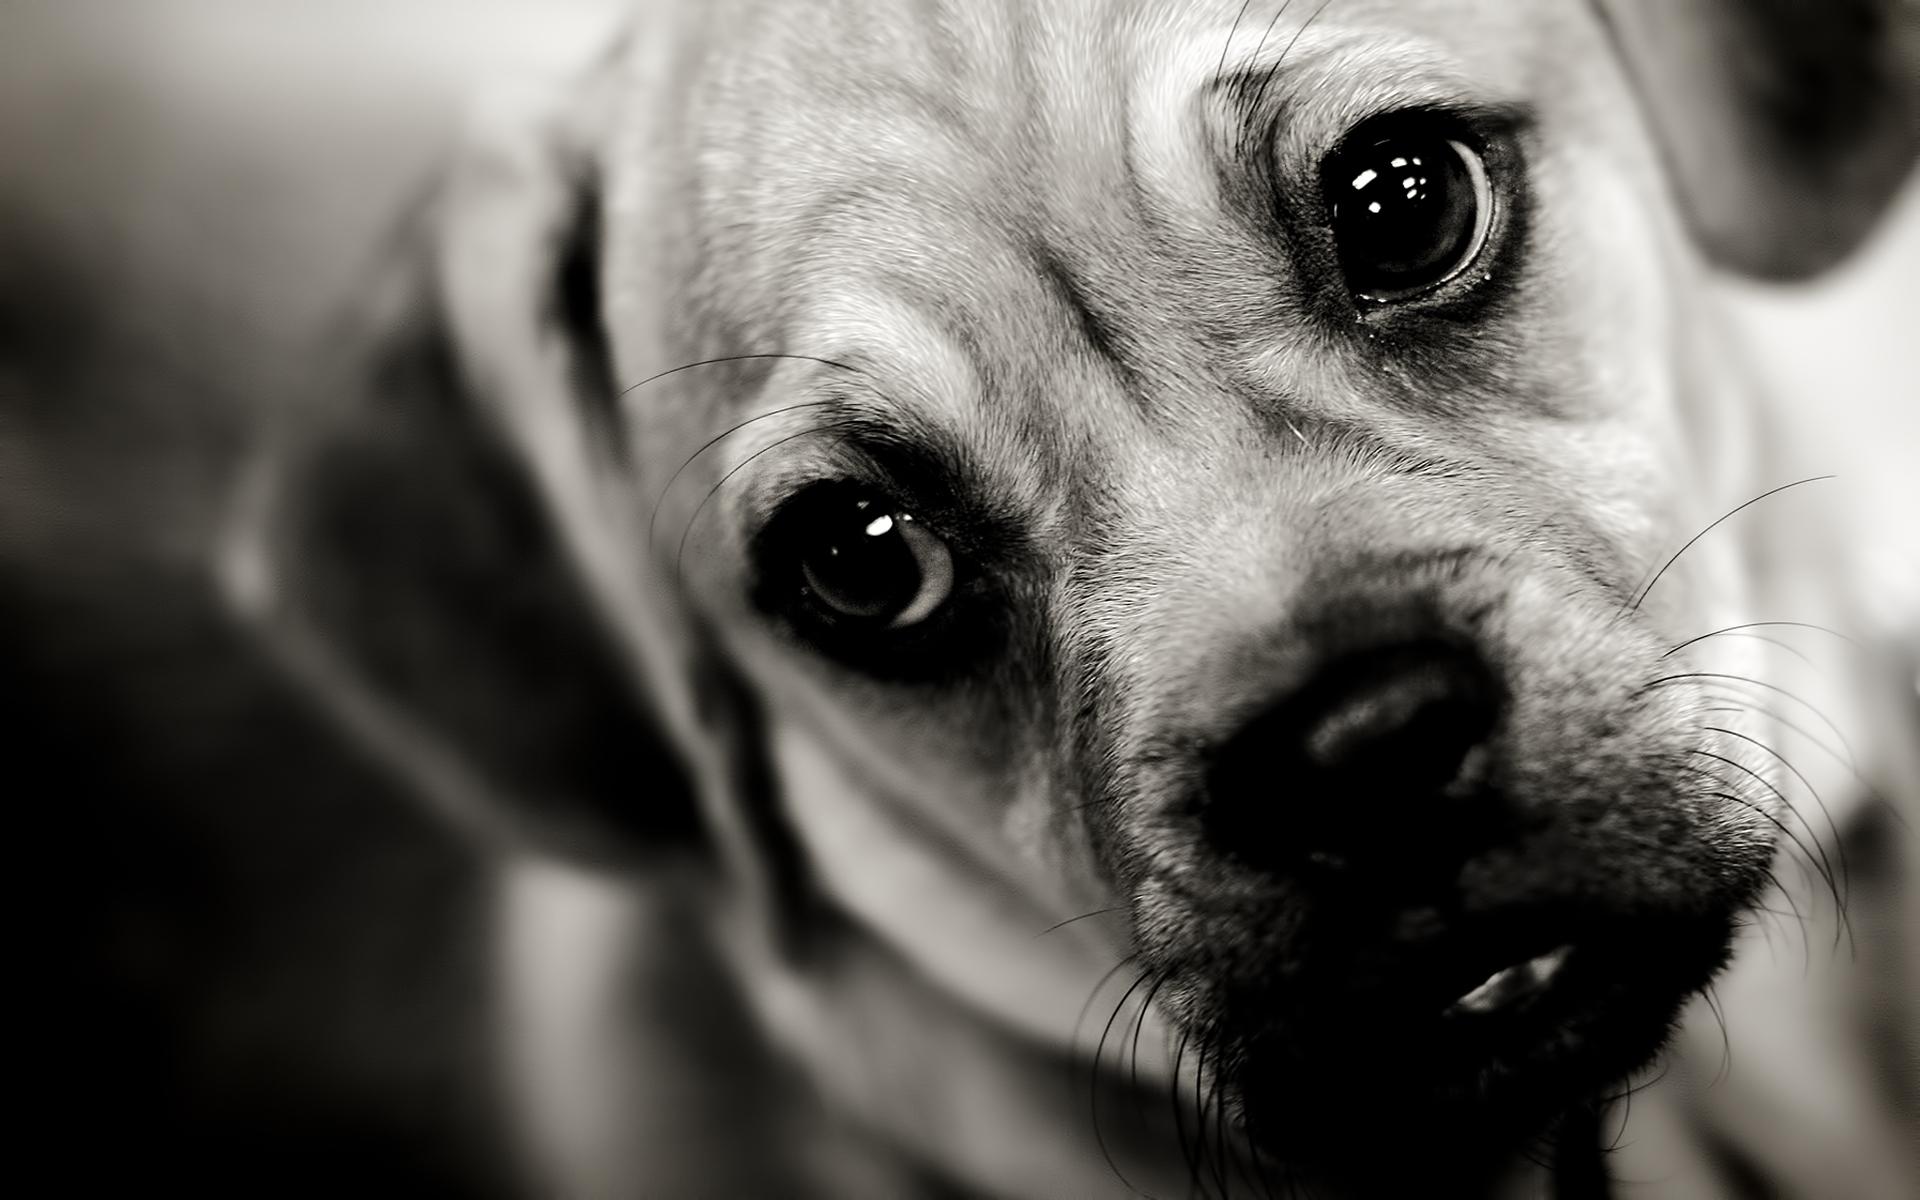 Wallpaper : puppy, dog, face, sad, sight 1920x1200 ...